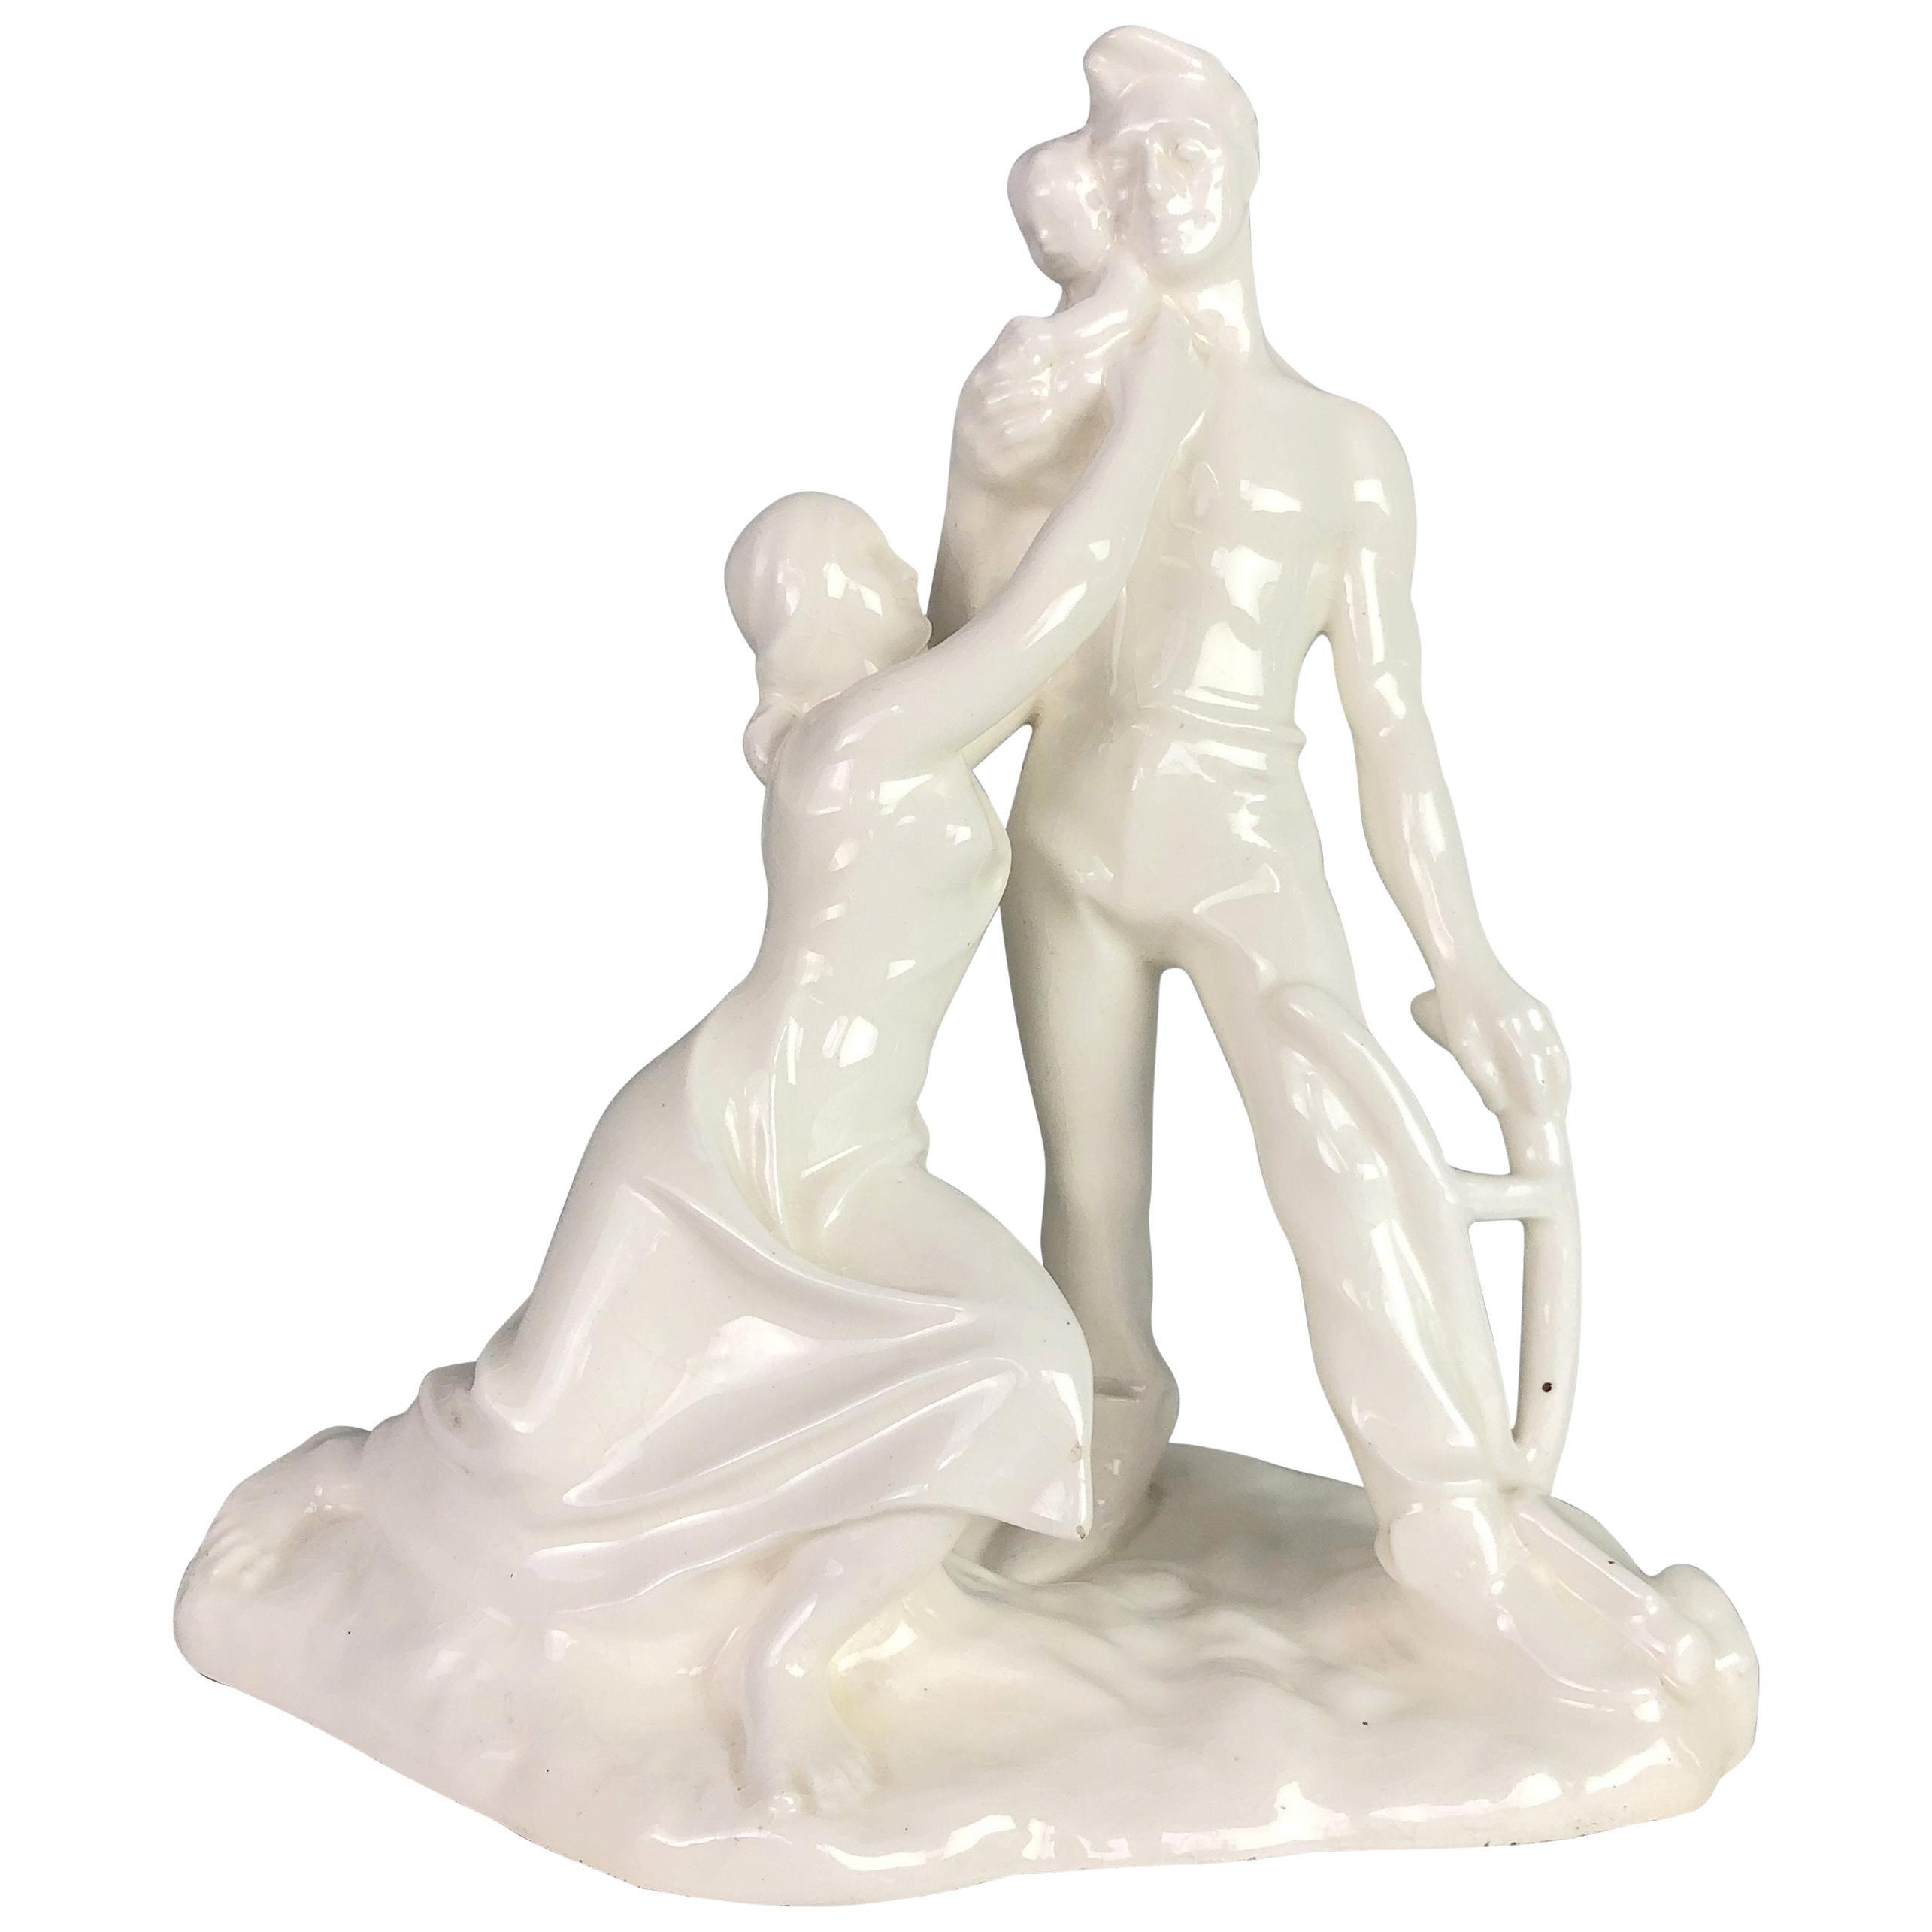 Glazed Ceramic Sculpture Signed by Emil Hlavica, 1930s